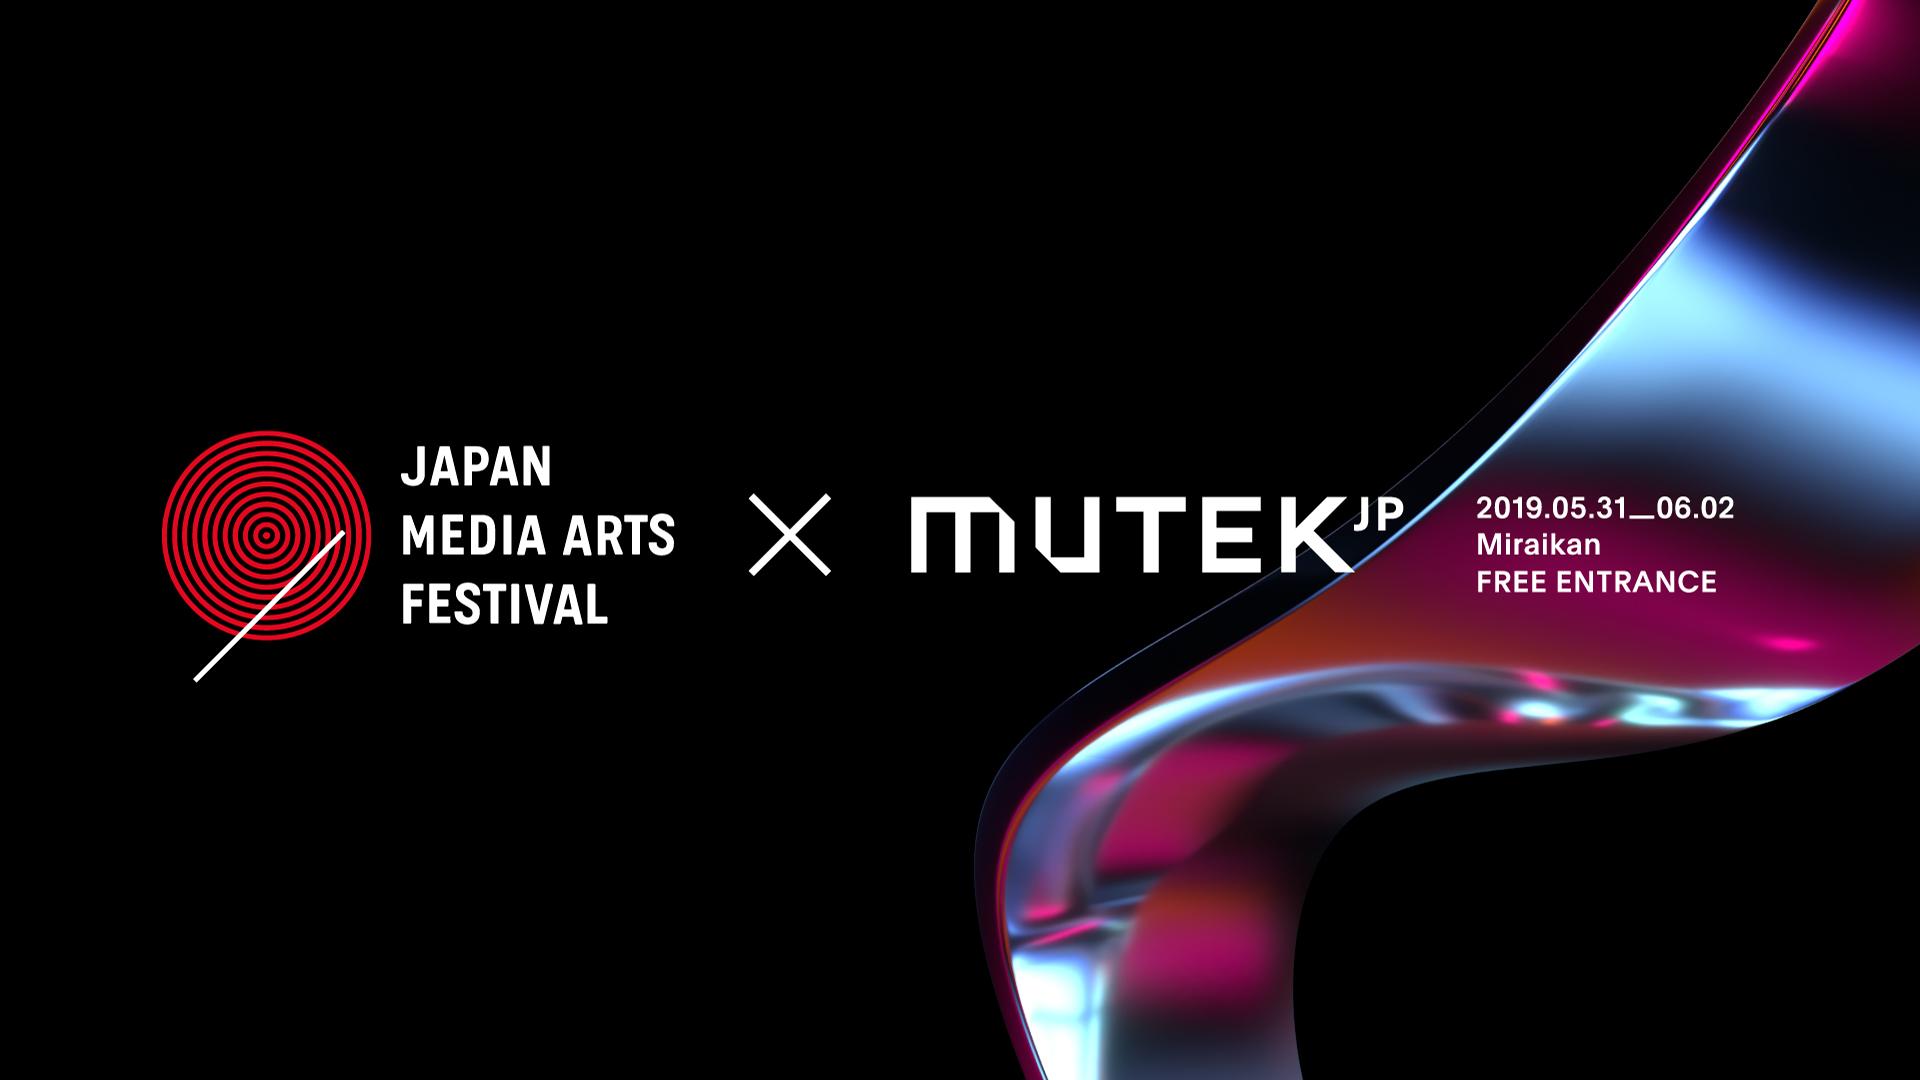 perform VJ at JAPAN MEDIA ARTS FESTIVAL × MUTEK.JP on 6/2. 13:00-13:45 Shattered Form x Mari Asada (marimosphere) + Shintaro Ono